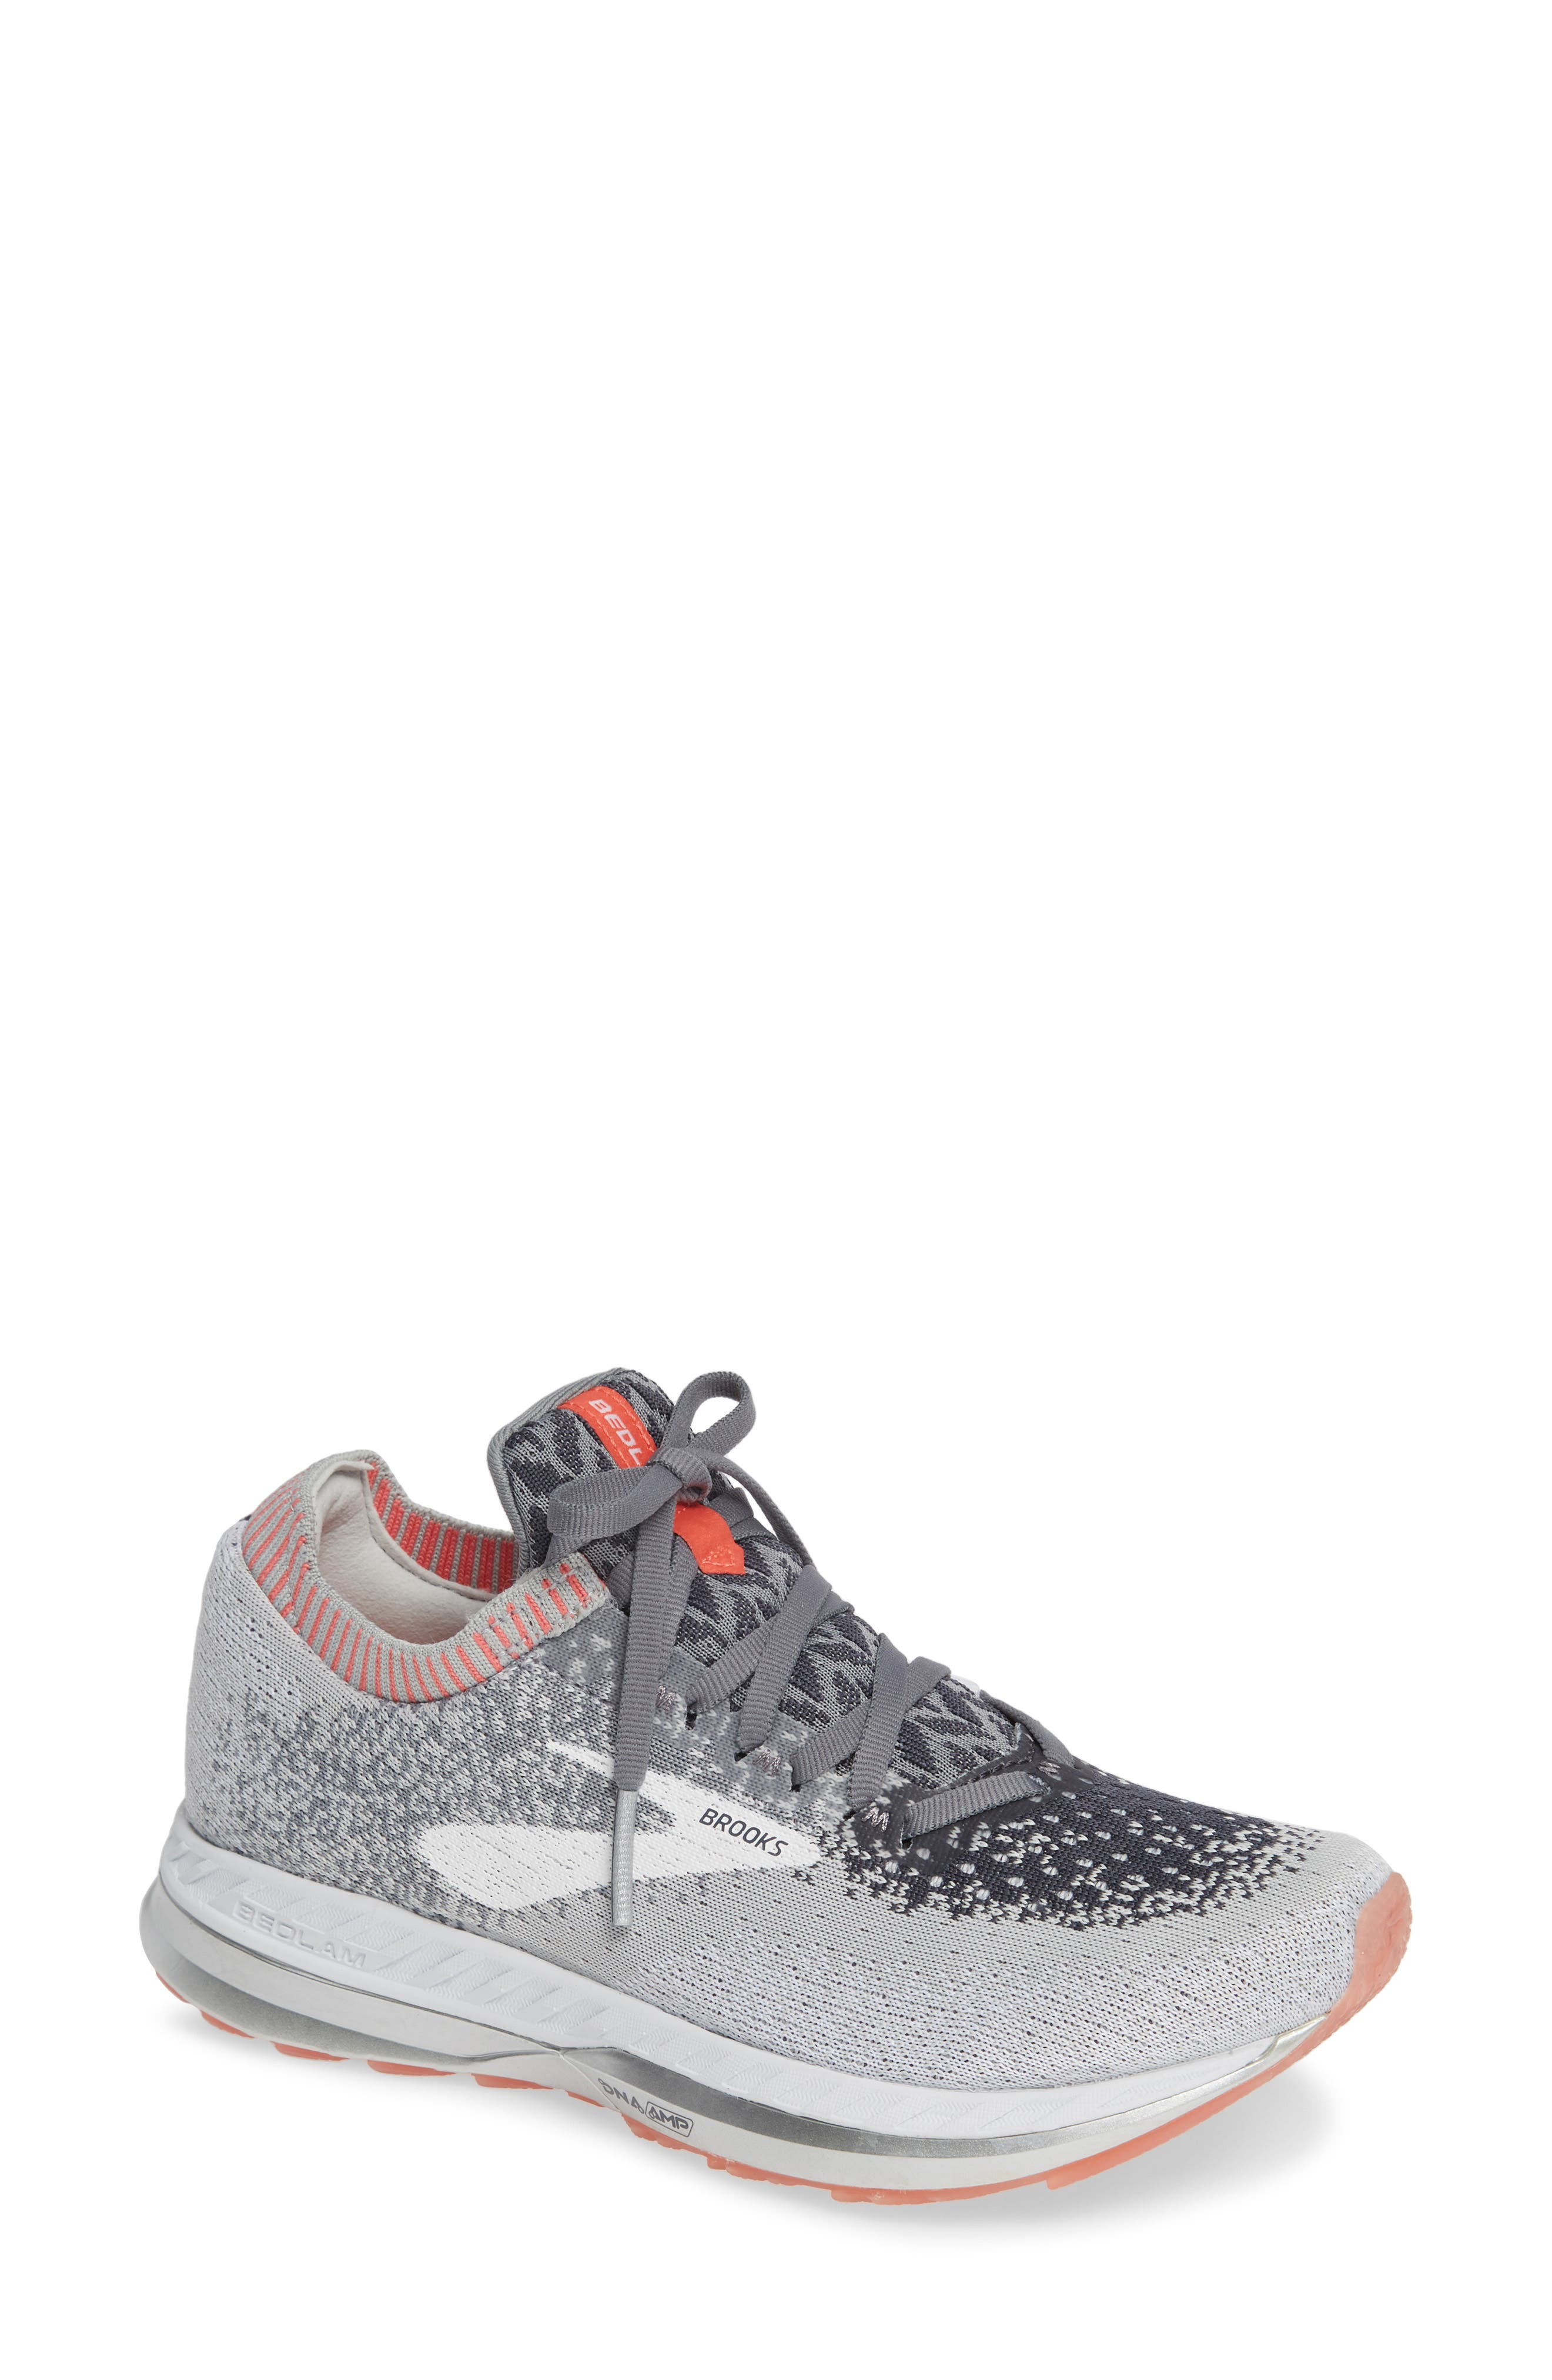 Brooks Bedlam Running Shoe, Grey